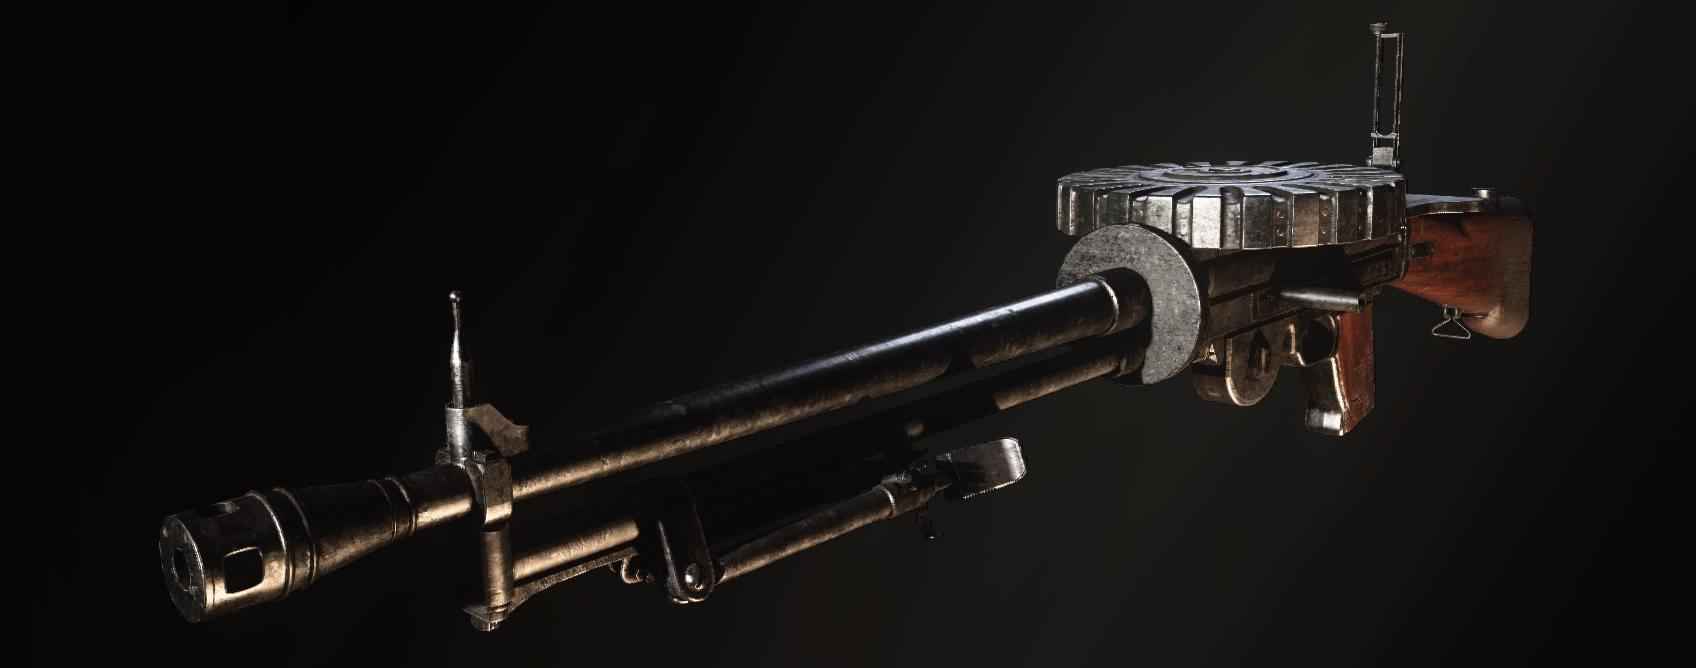 Lewis (weapon) | Call of Duty Wiki | FANDOM powered by Wikia